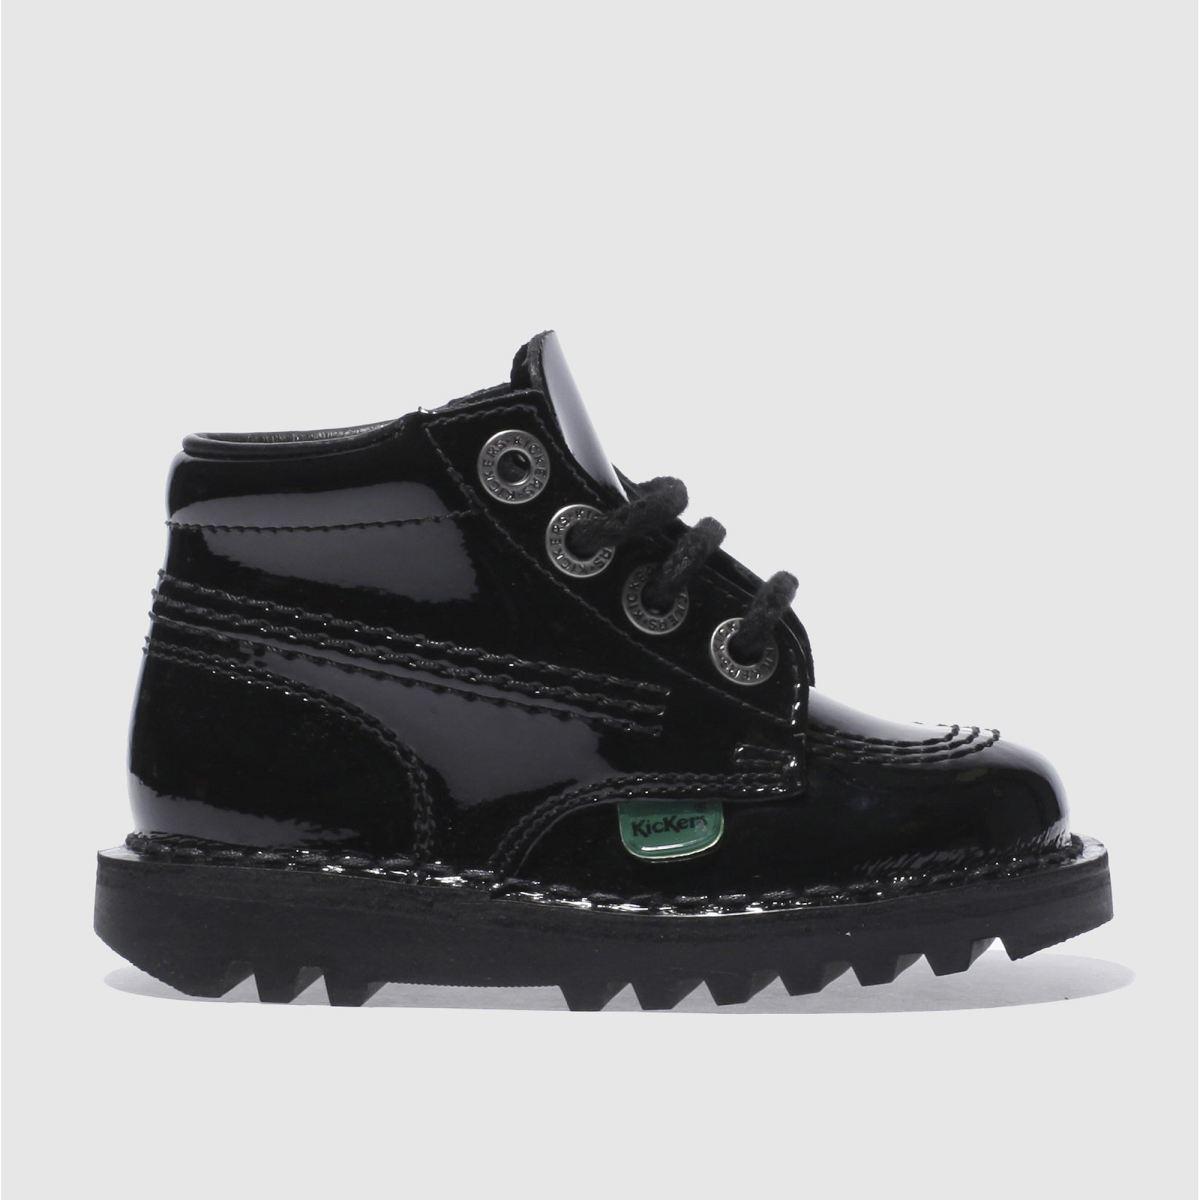 Kickers Black Kick Hi Patent Boots Toddler